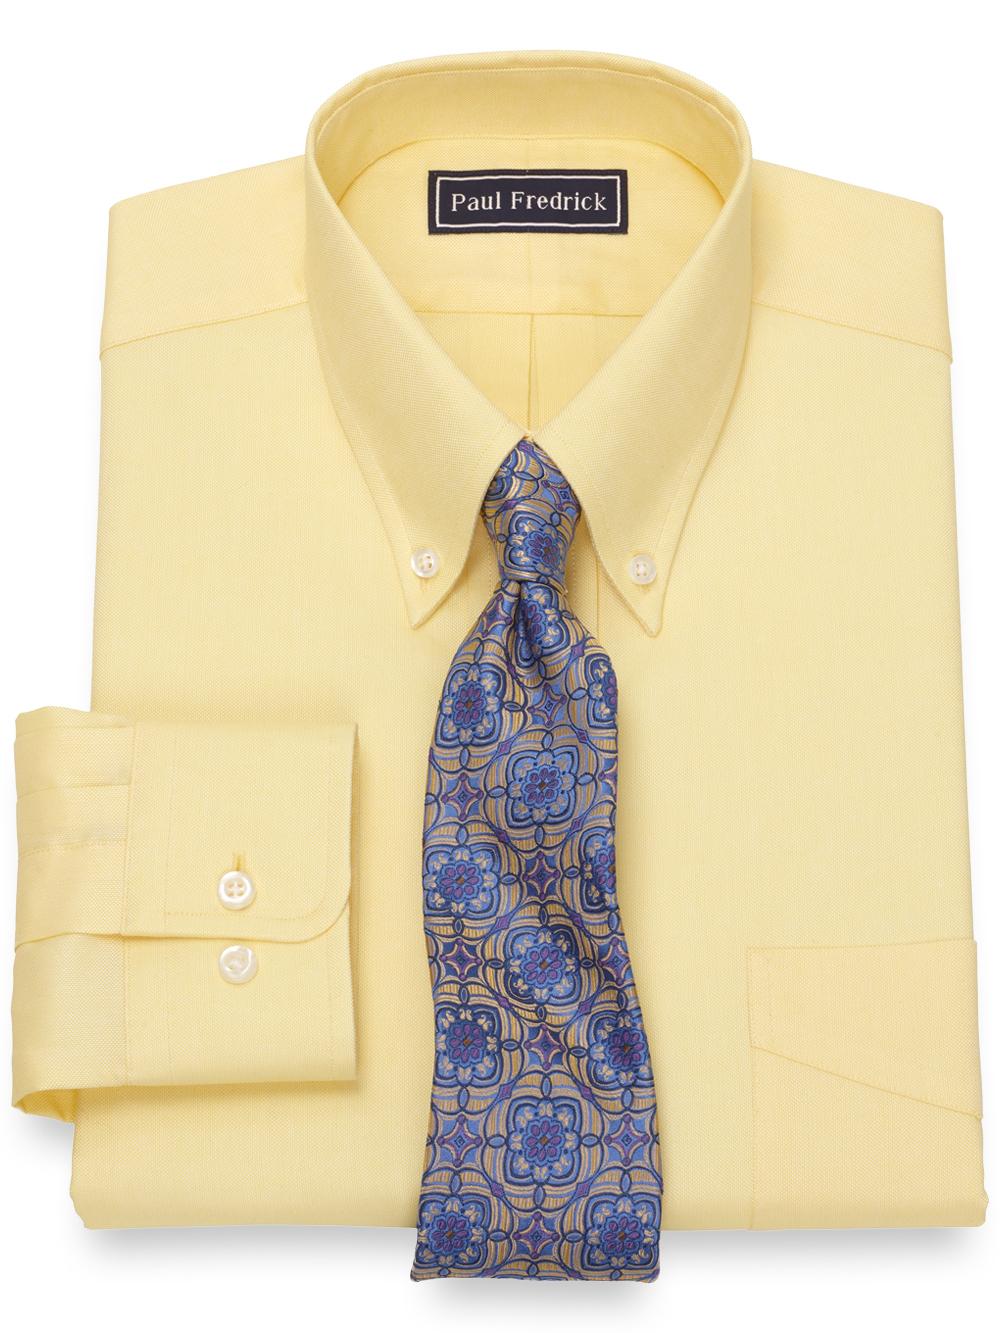 7e8efd6c9b0 Pure Cotton Pinpoint Solid Color Button Down Collar Dress Shirt ...